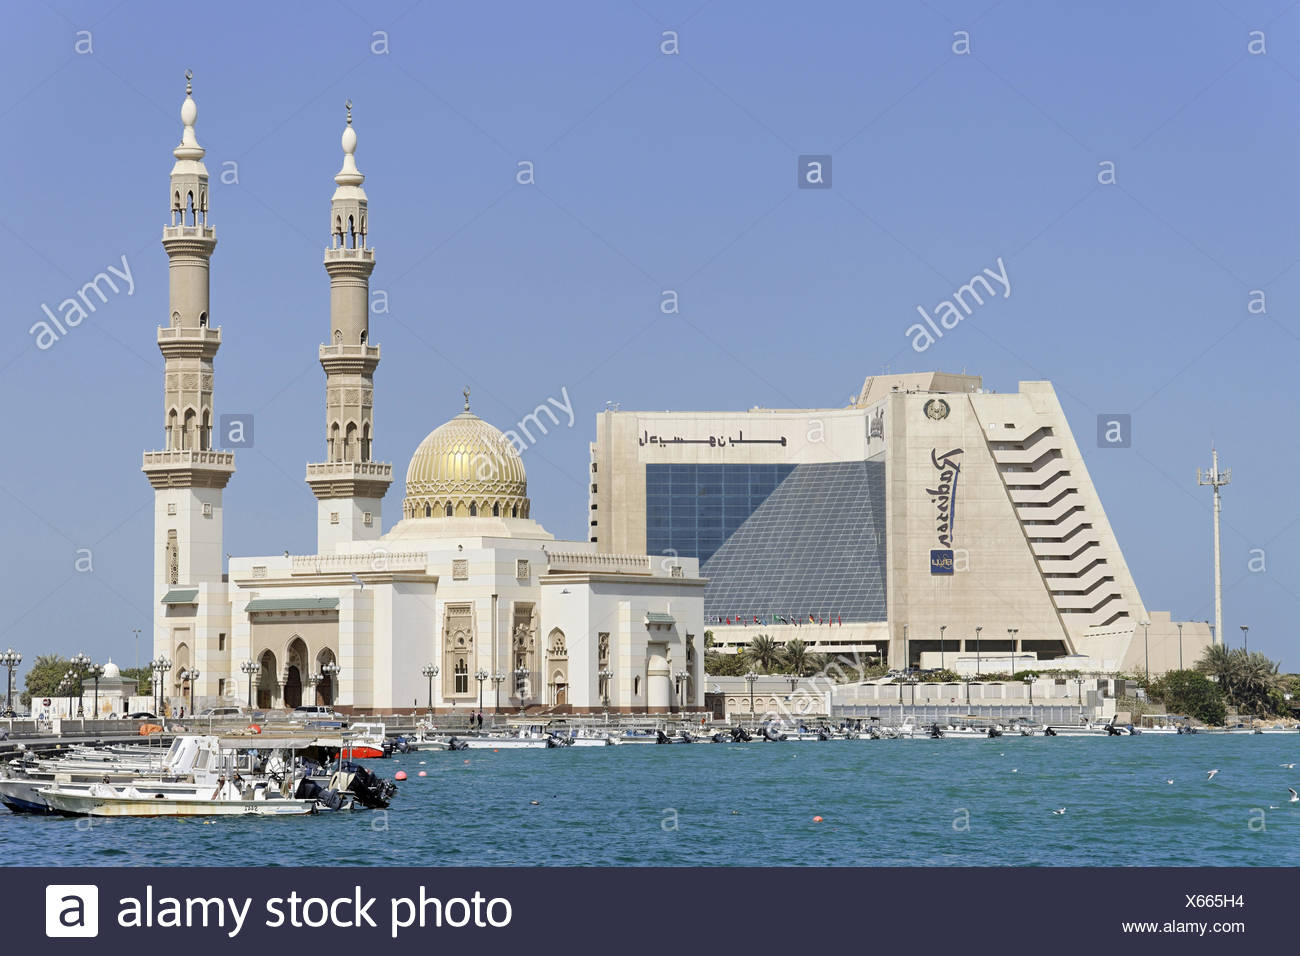 Five-star hotel Radisson Blu, Corniche Road, emirate Sharjah, United Arab Emirates, Arabian peninsula, the Middle East, Asia, - Stock Image